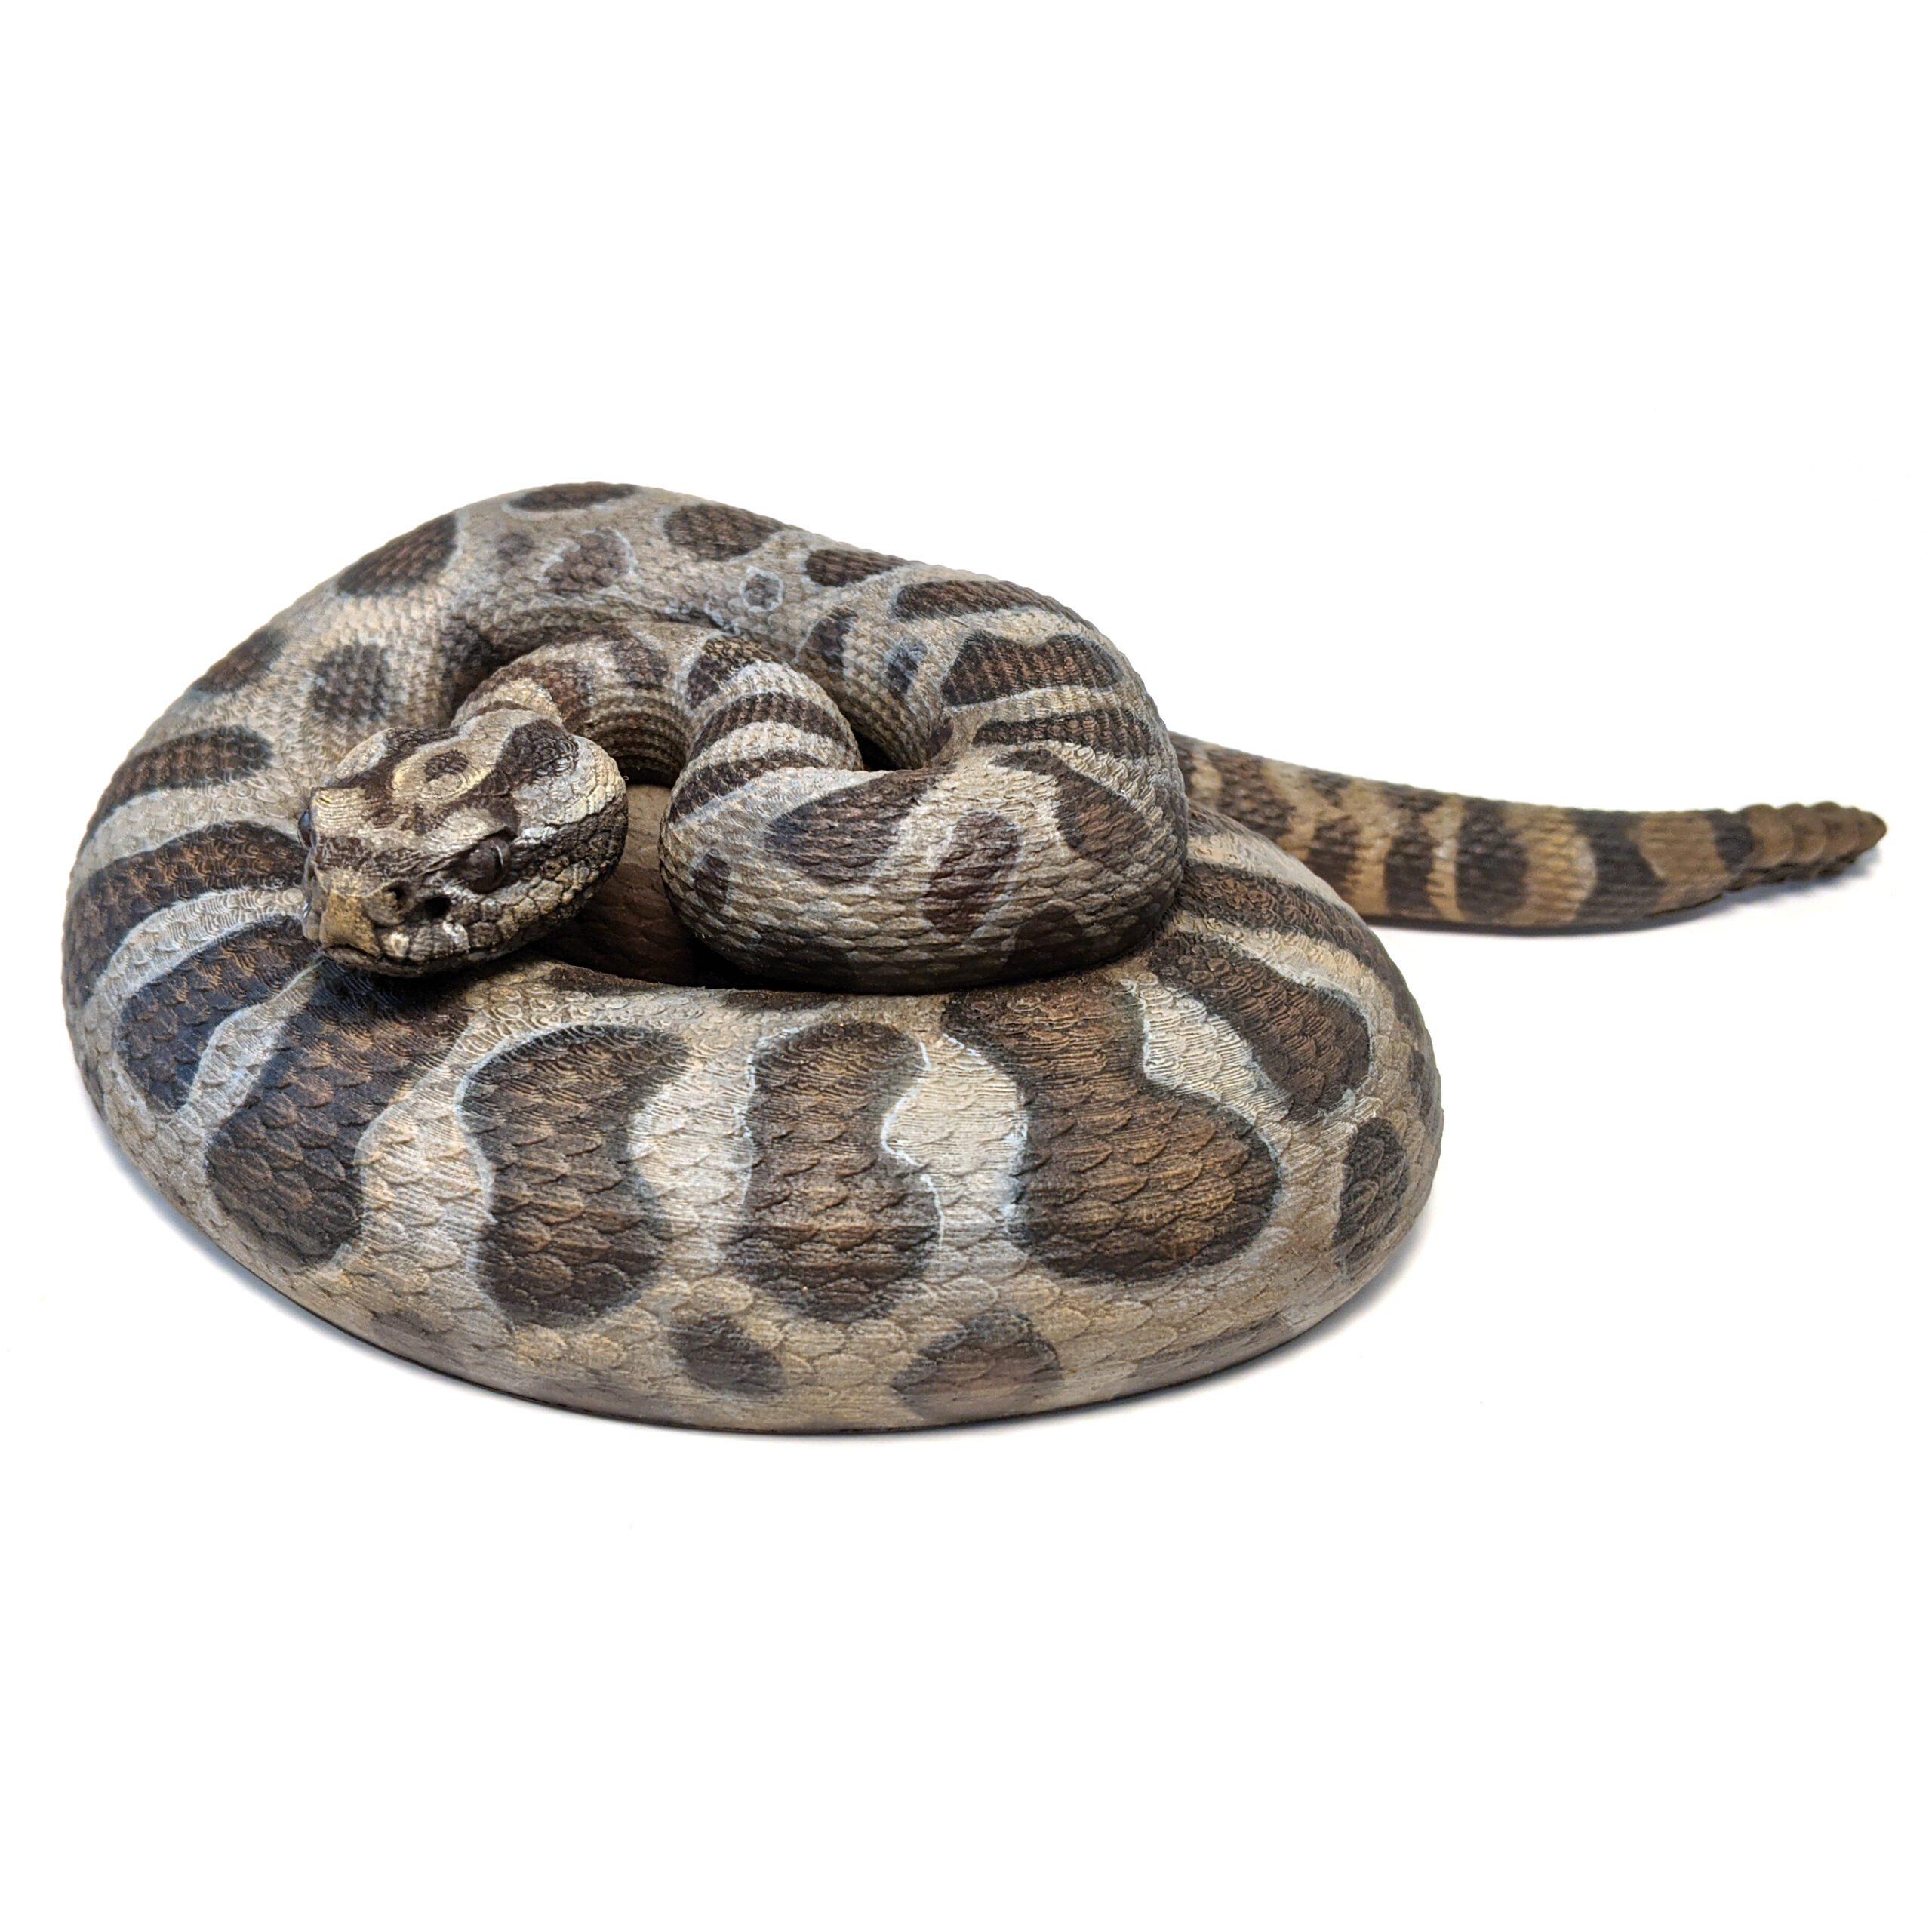 Massasauga Rattlesnake (Sistrurus Catenatus) Model